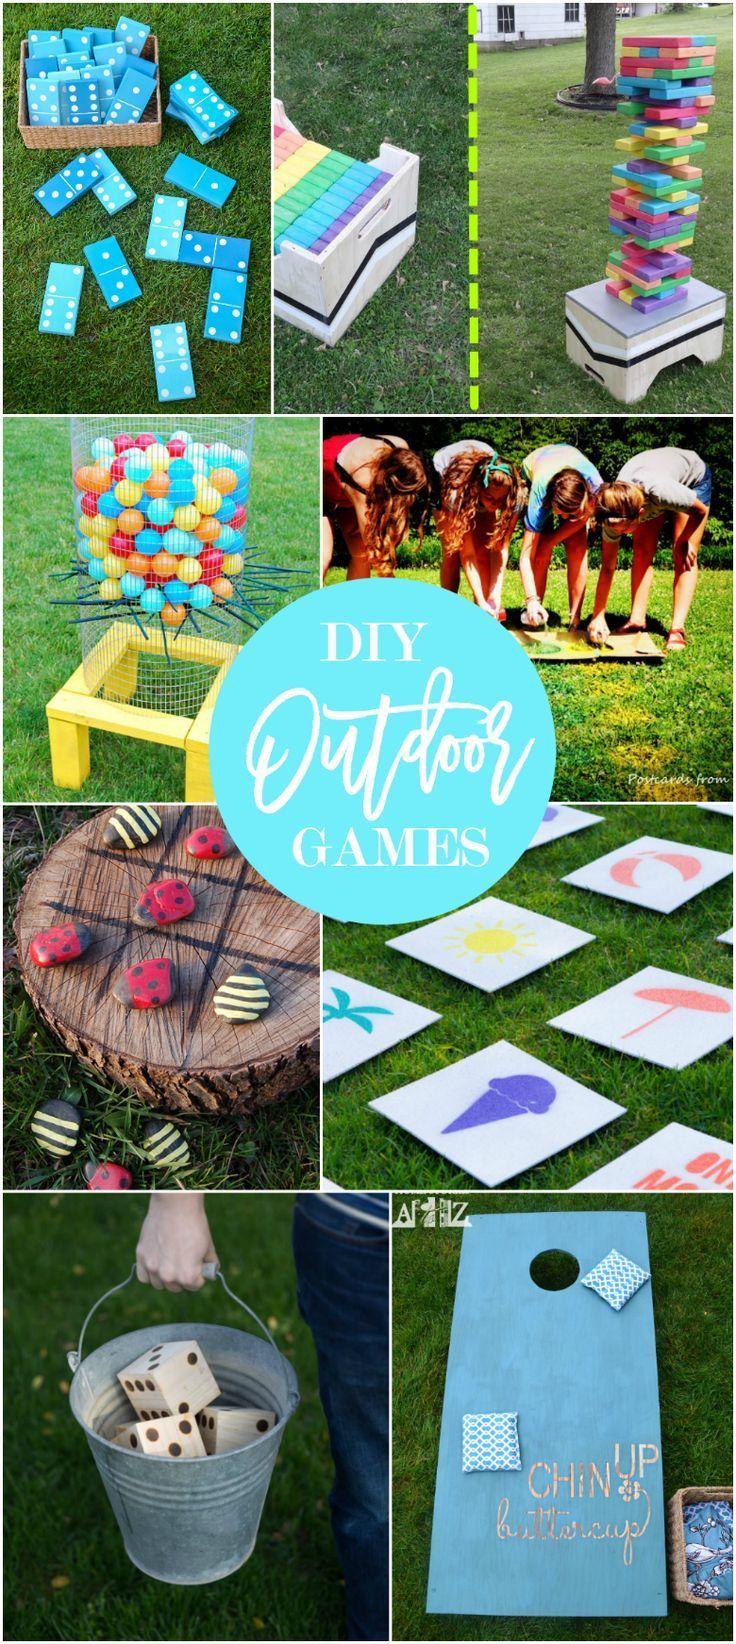 17 diy games for outdoor family fun diy games backyard and